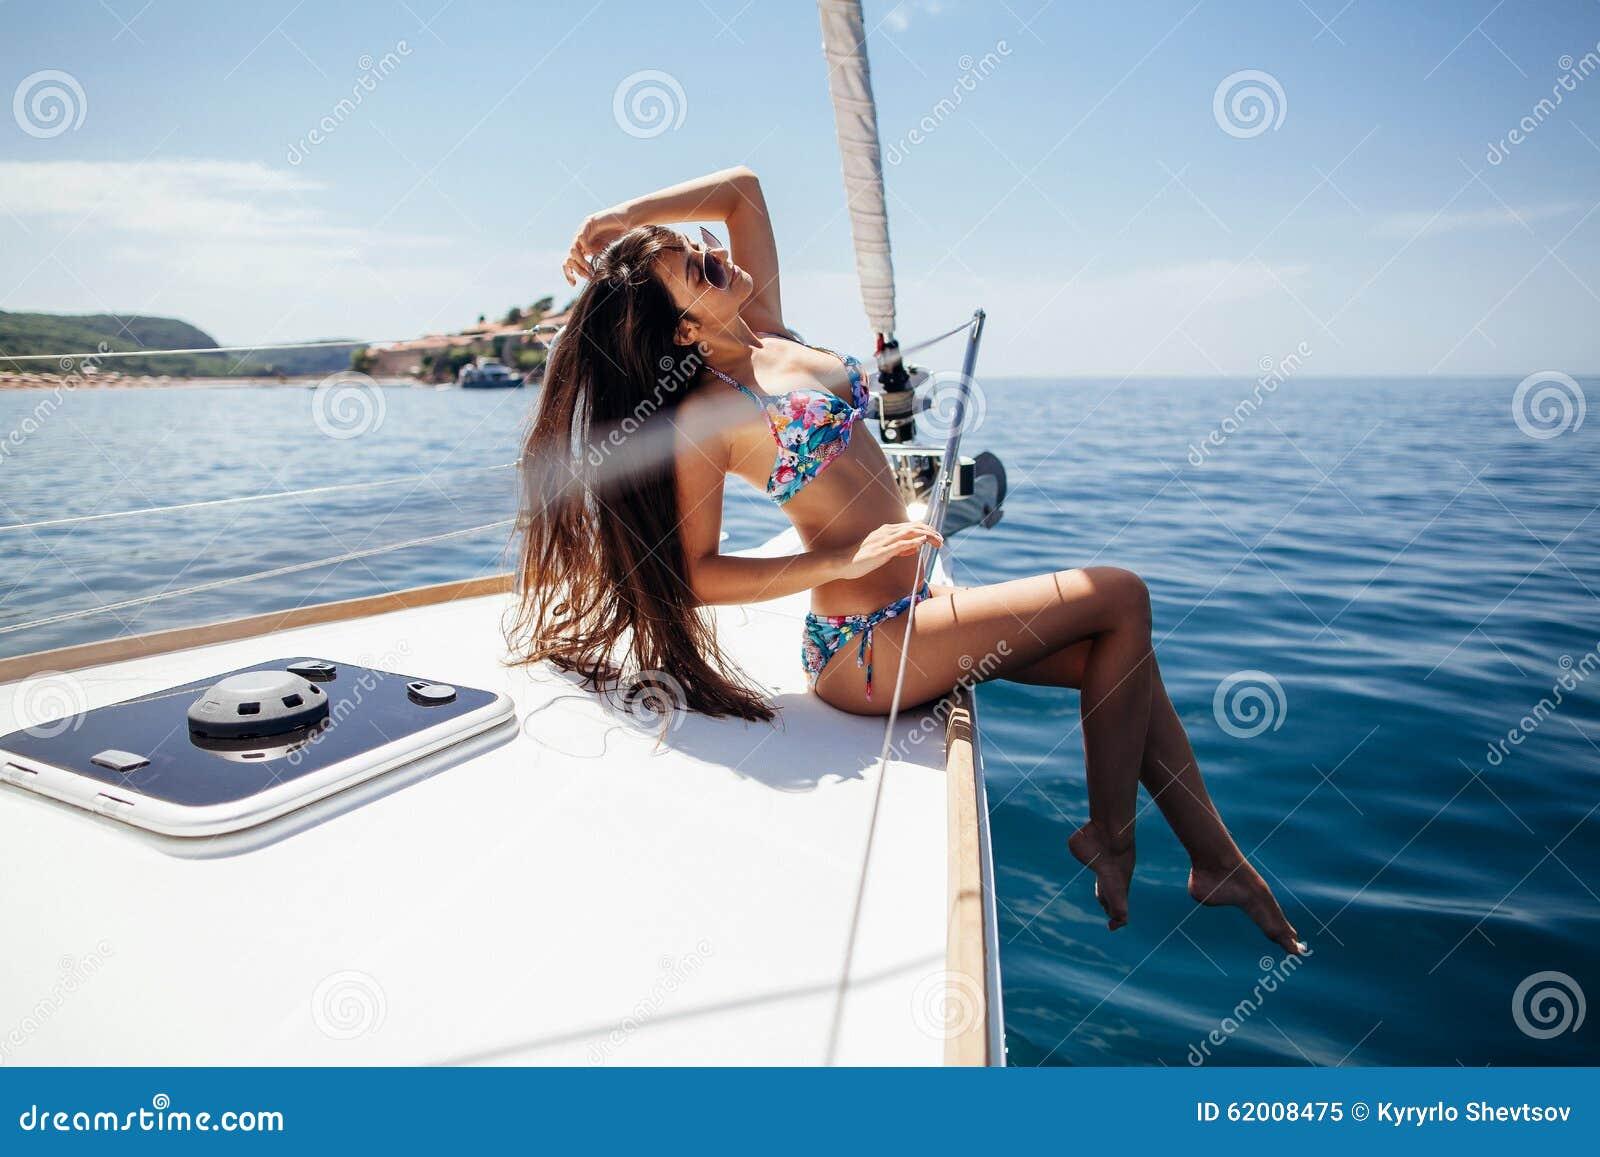 Сексуальная девушка на яхте